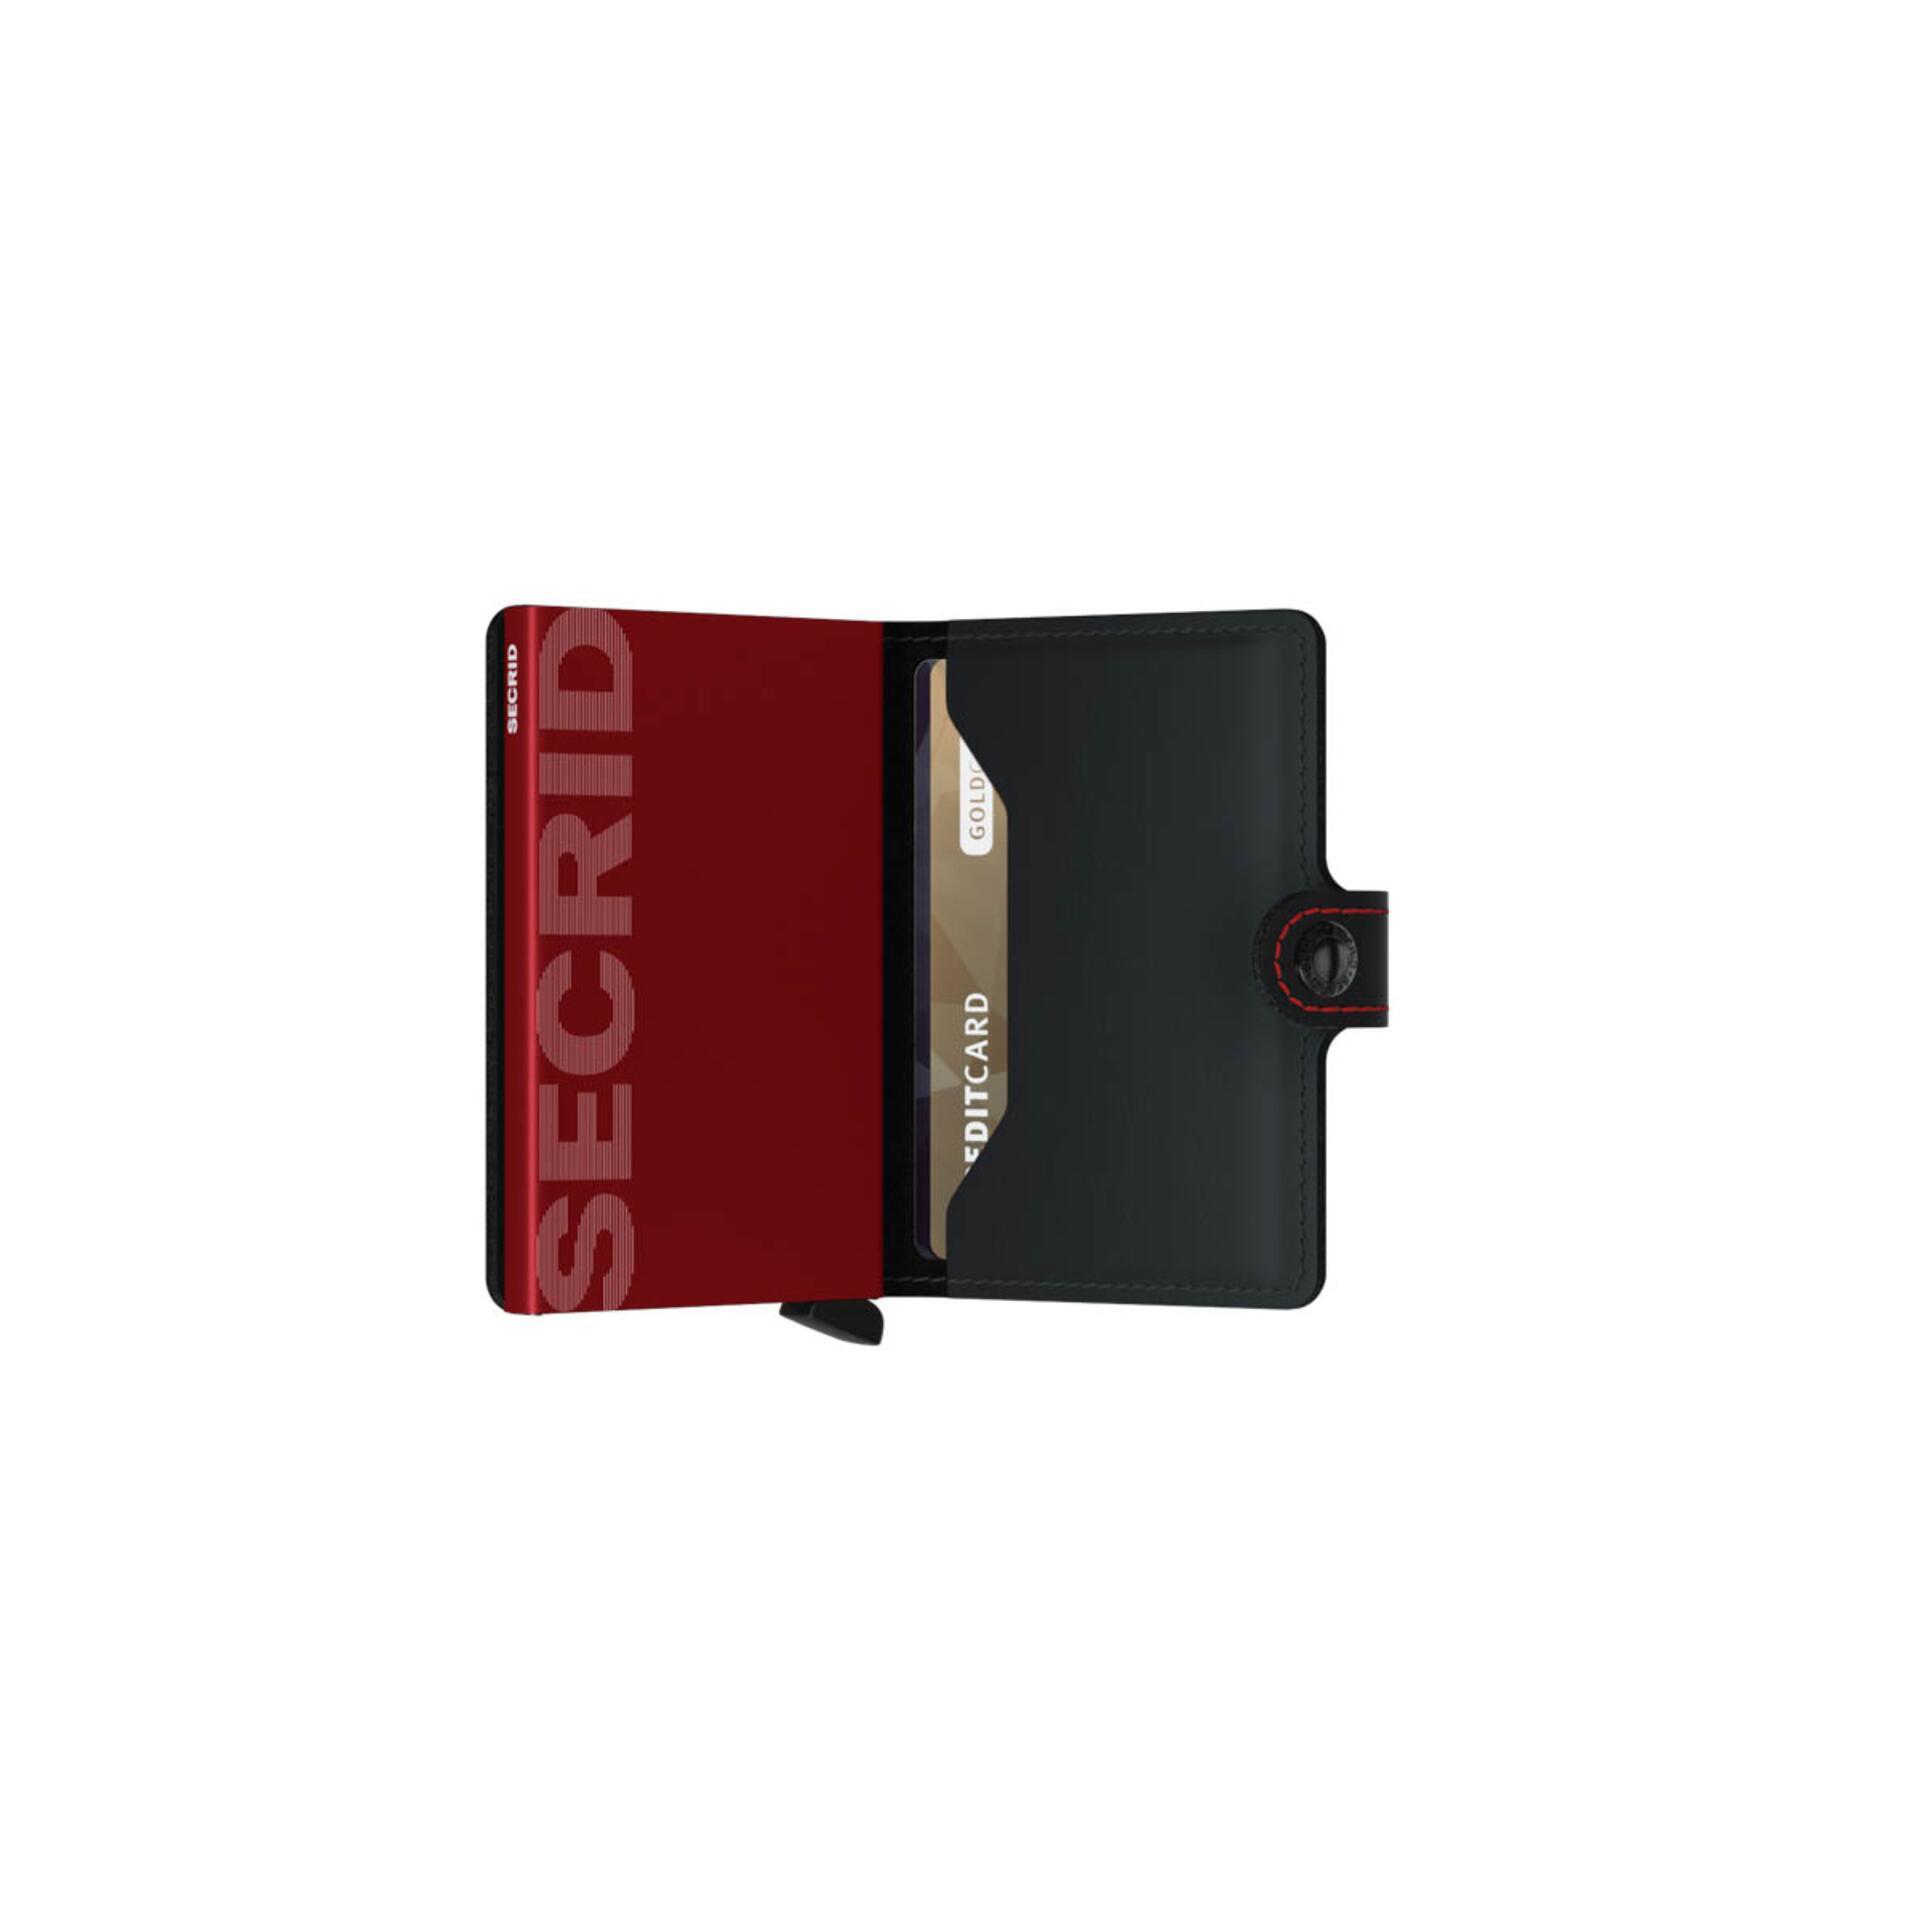 Secrid Miniwallet Matte Black & Red